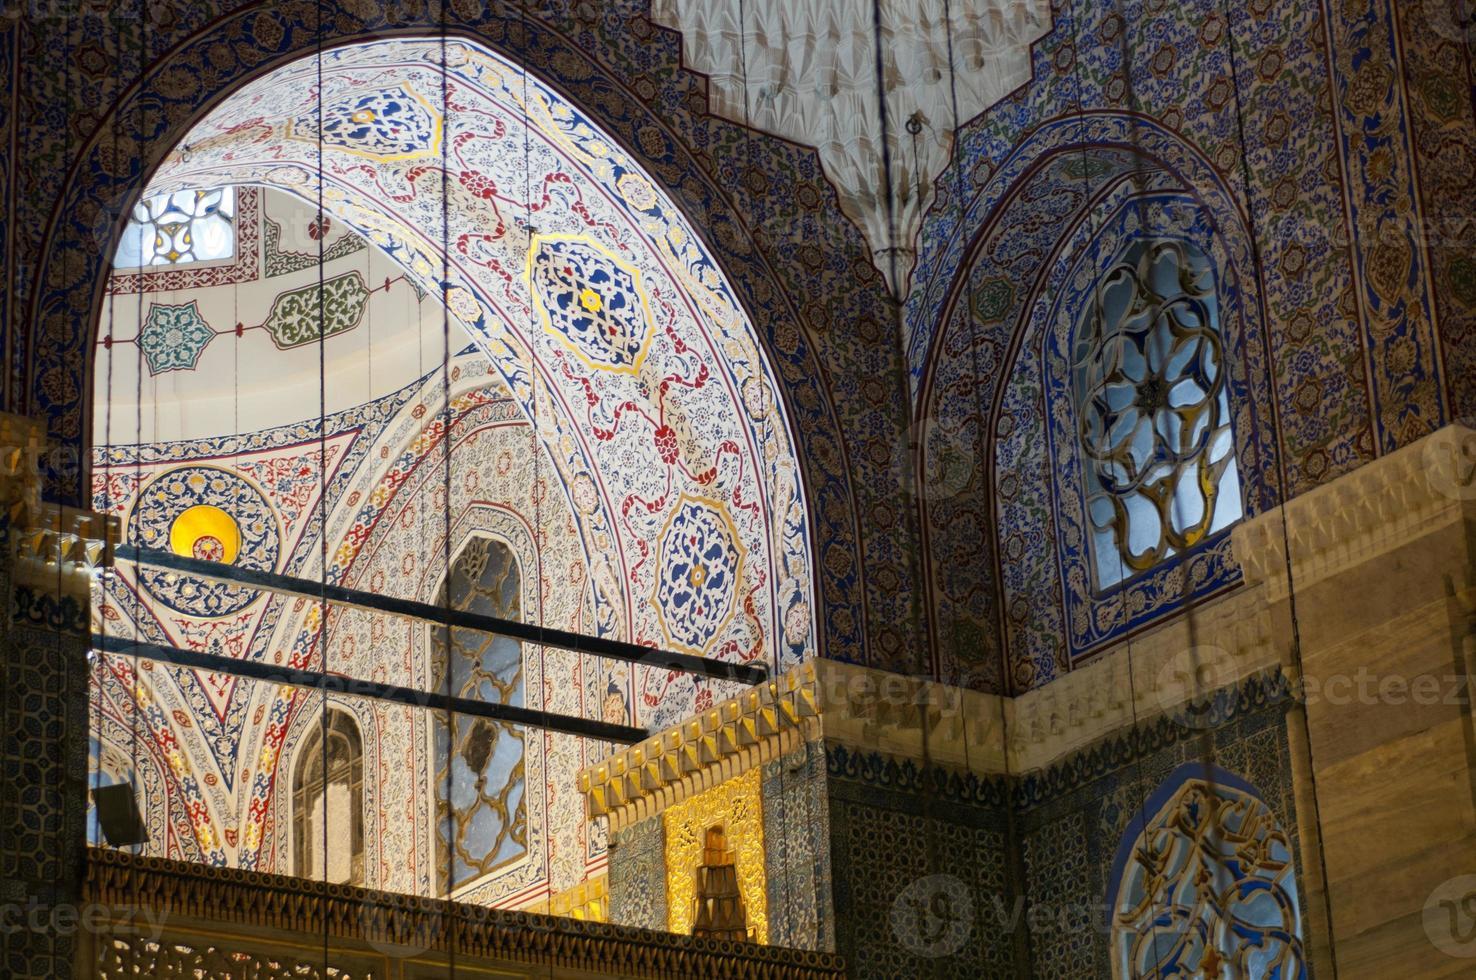 moskee interieur, detail, istanbul, turkije foto